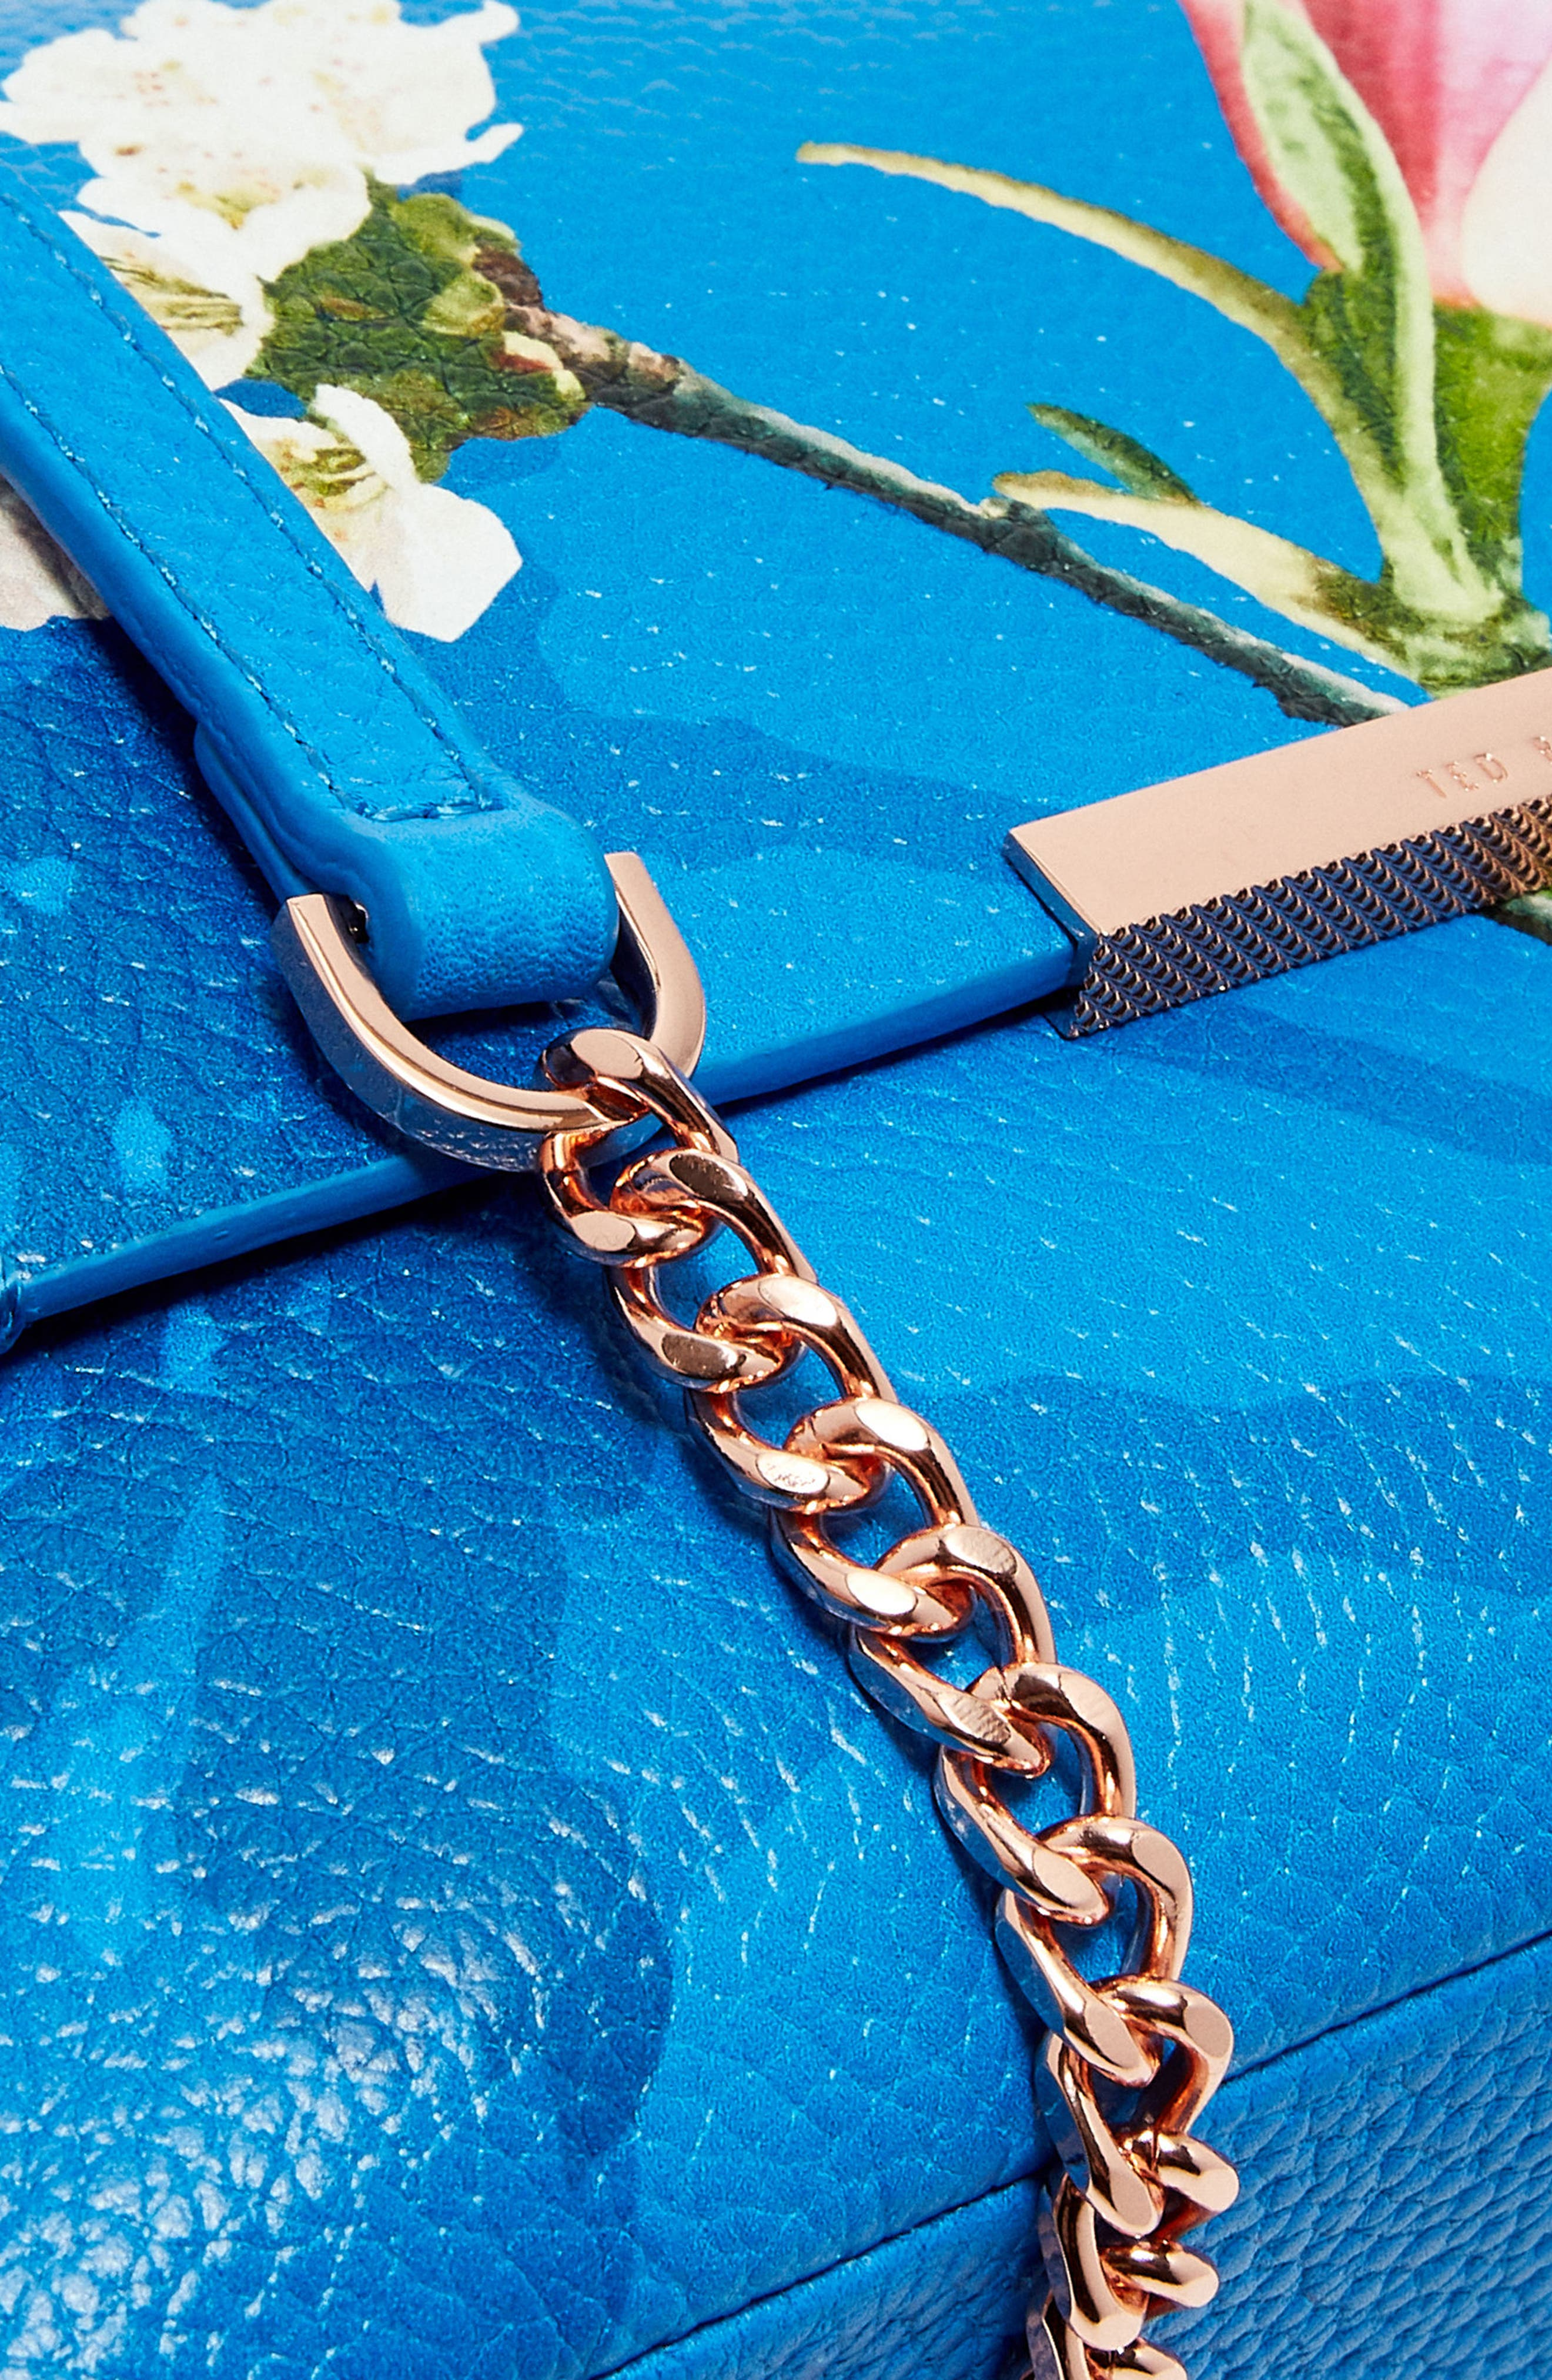 Haalle Harmony Leather Crossbody Bag,                             Alternate thumbnail 5, color,                             Bright Blue